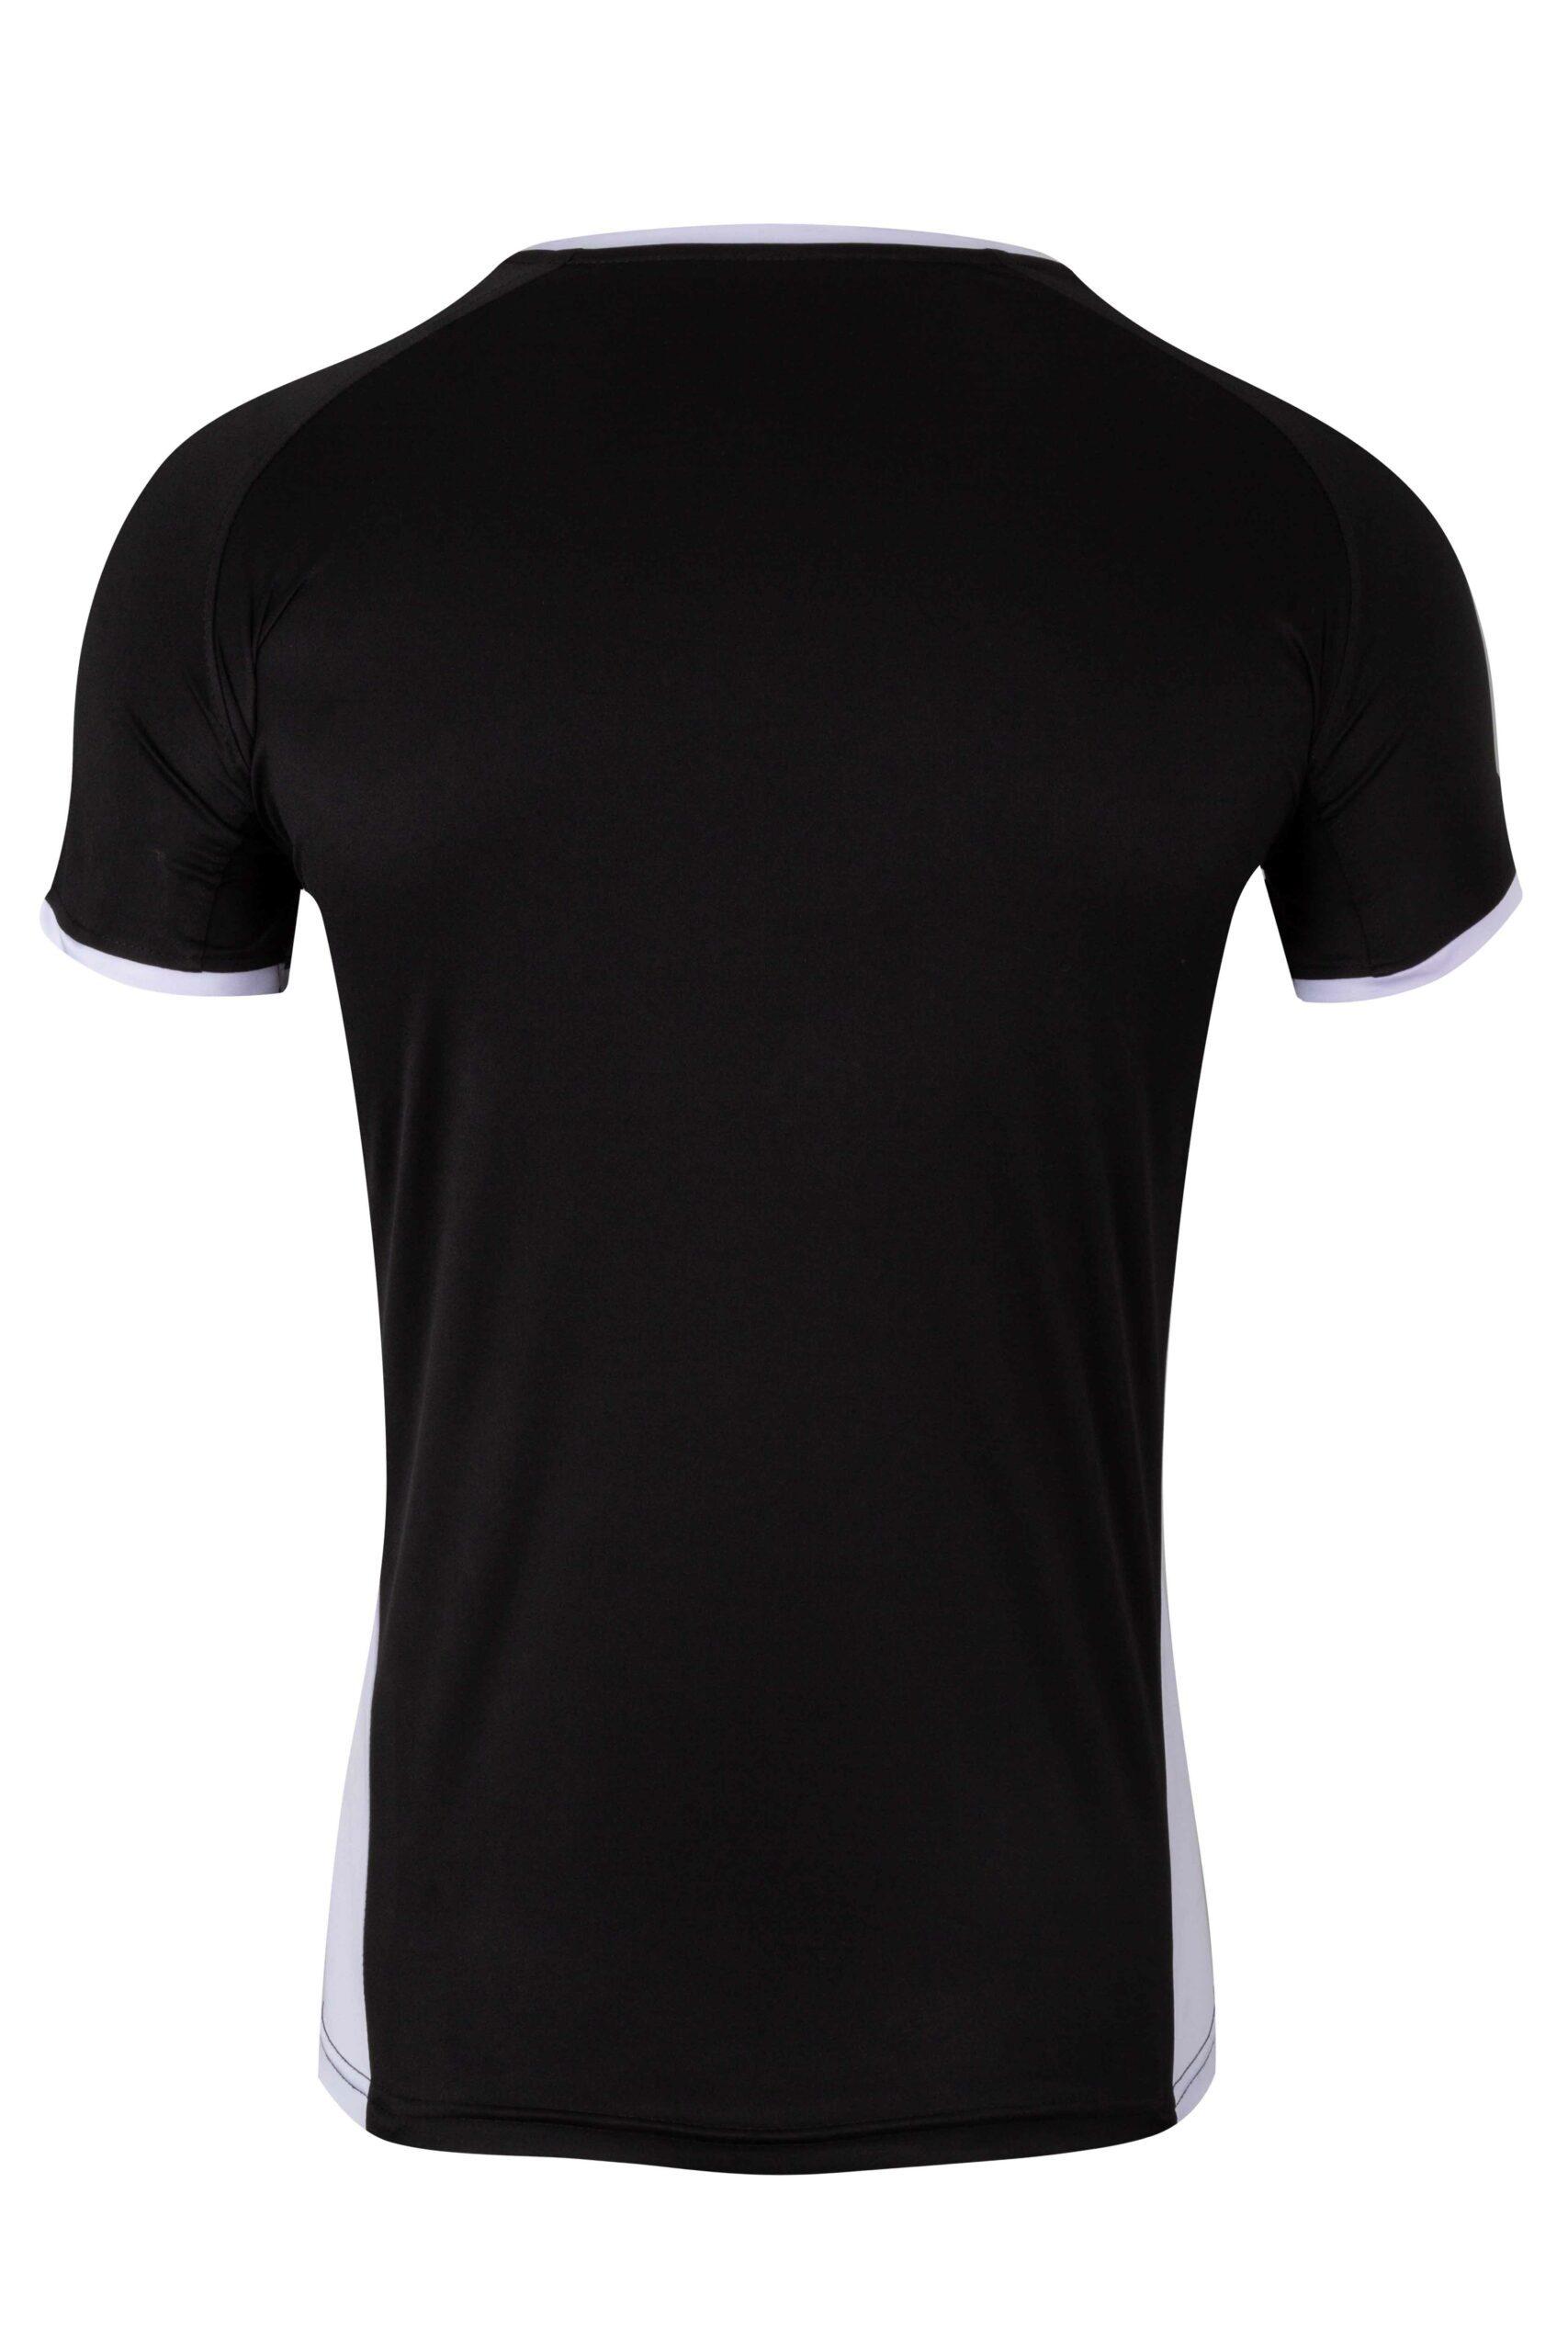 Mukua Mk531v Camiseta TÉcnica Manga Corta Bicolor NiÑo Black 2